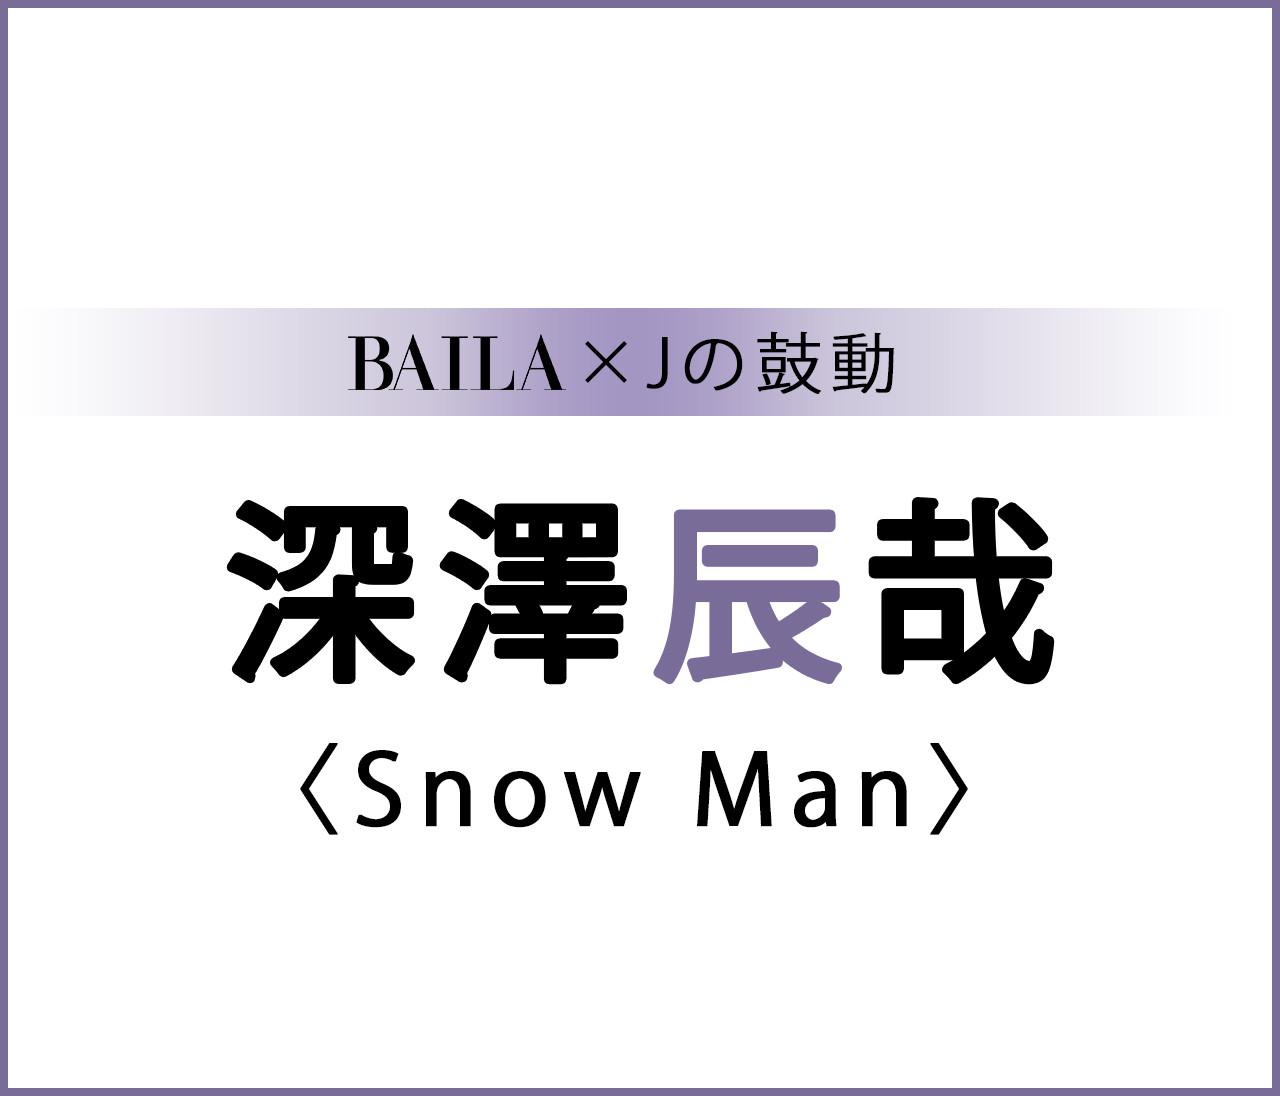 【 #SnowMan #深澤辰哉 】深澤辰哉スペシャルインタビュー!【BAILA × Jの鼓動】